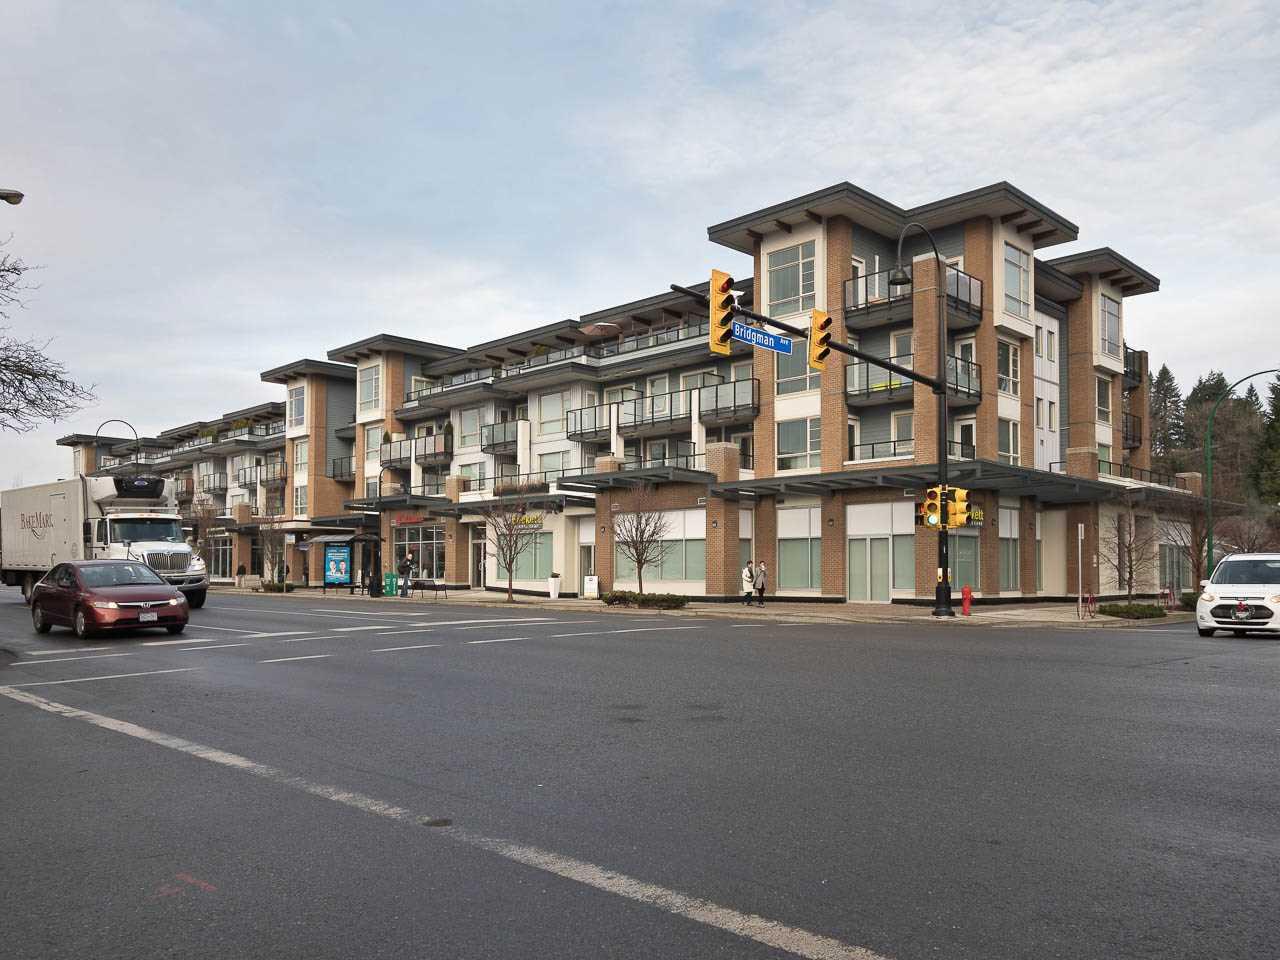 Sold: 220 - 1330 Marine Drive, North Vancouver, BC